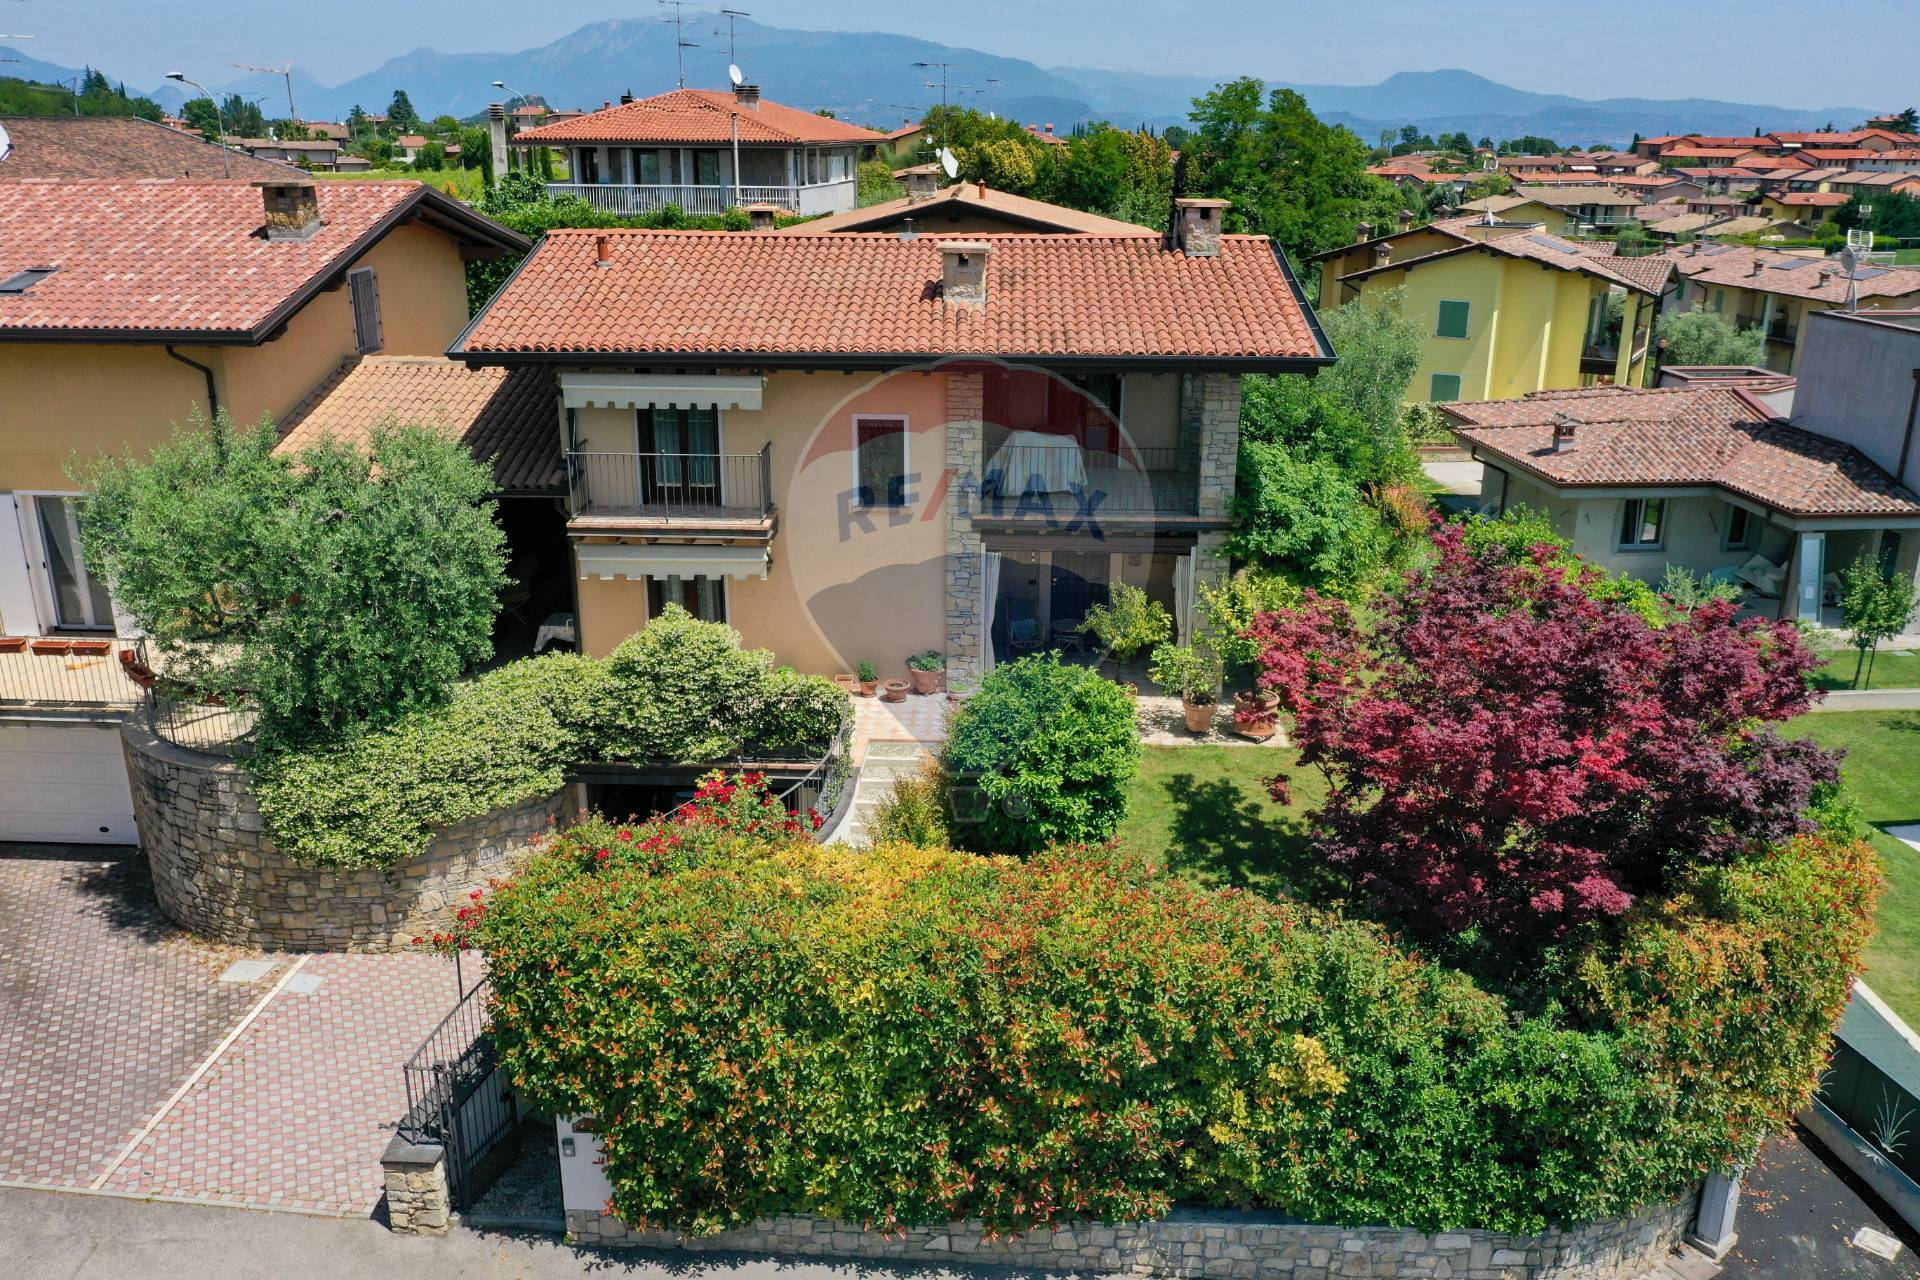 Villa Bifamiliare in Vendita a Moniga del Garda